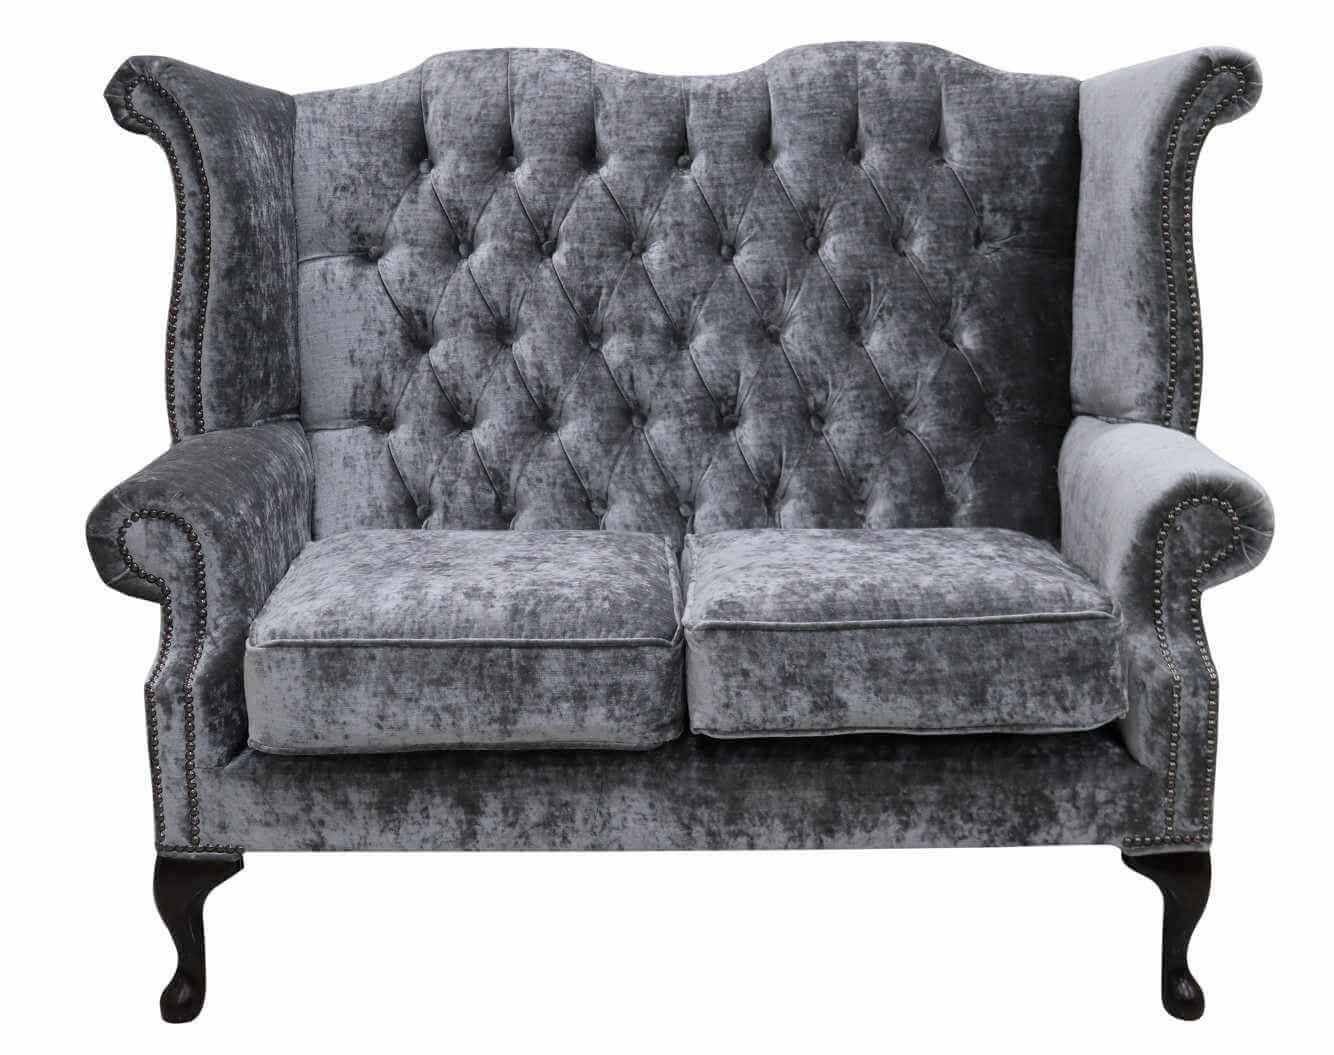 Sensational Details About Chesterfield 2 Seater Queen Anne High Back Wing Sofa Modena Regency Grey Velvet Dailytribune Chair Design For Home Dailytribuneorg